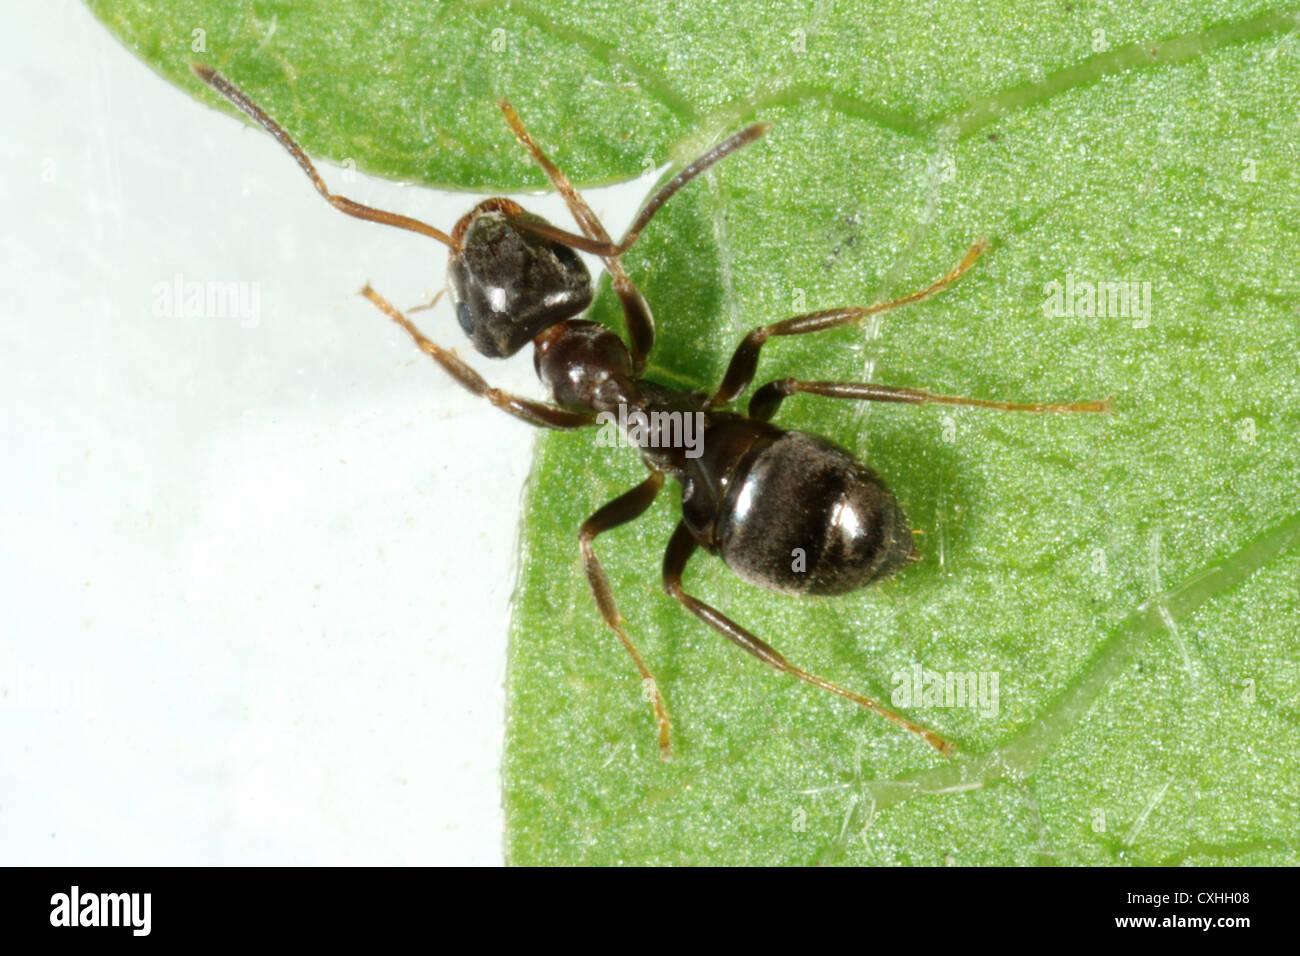 Black ant (Lasius niger) on a leaf - Stock Image